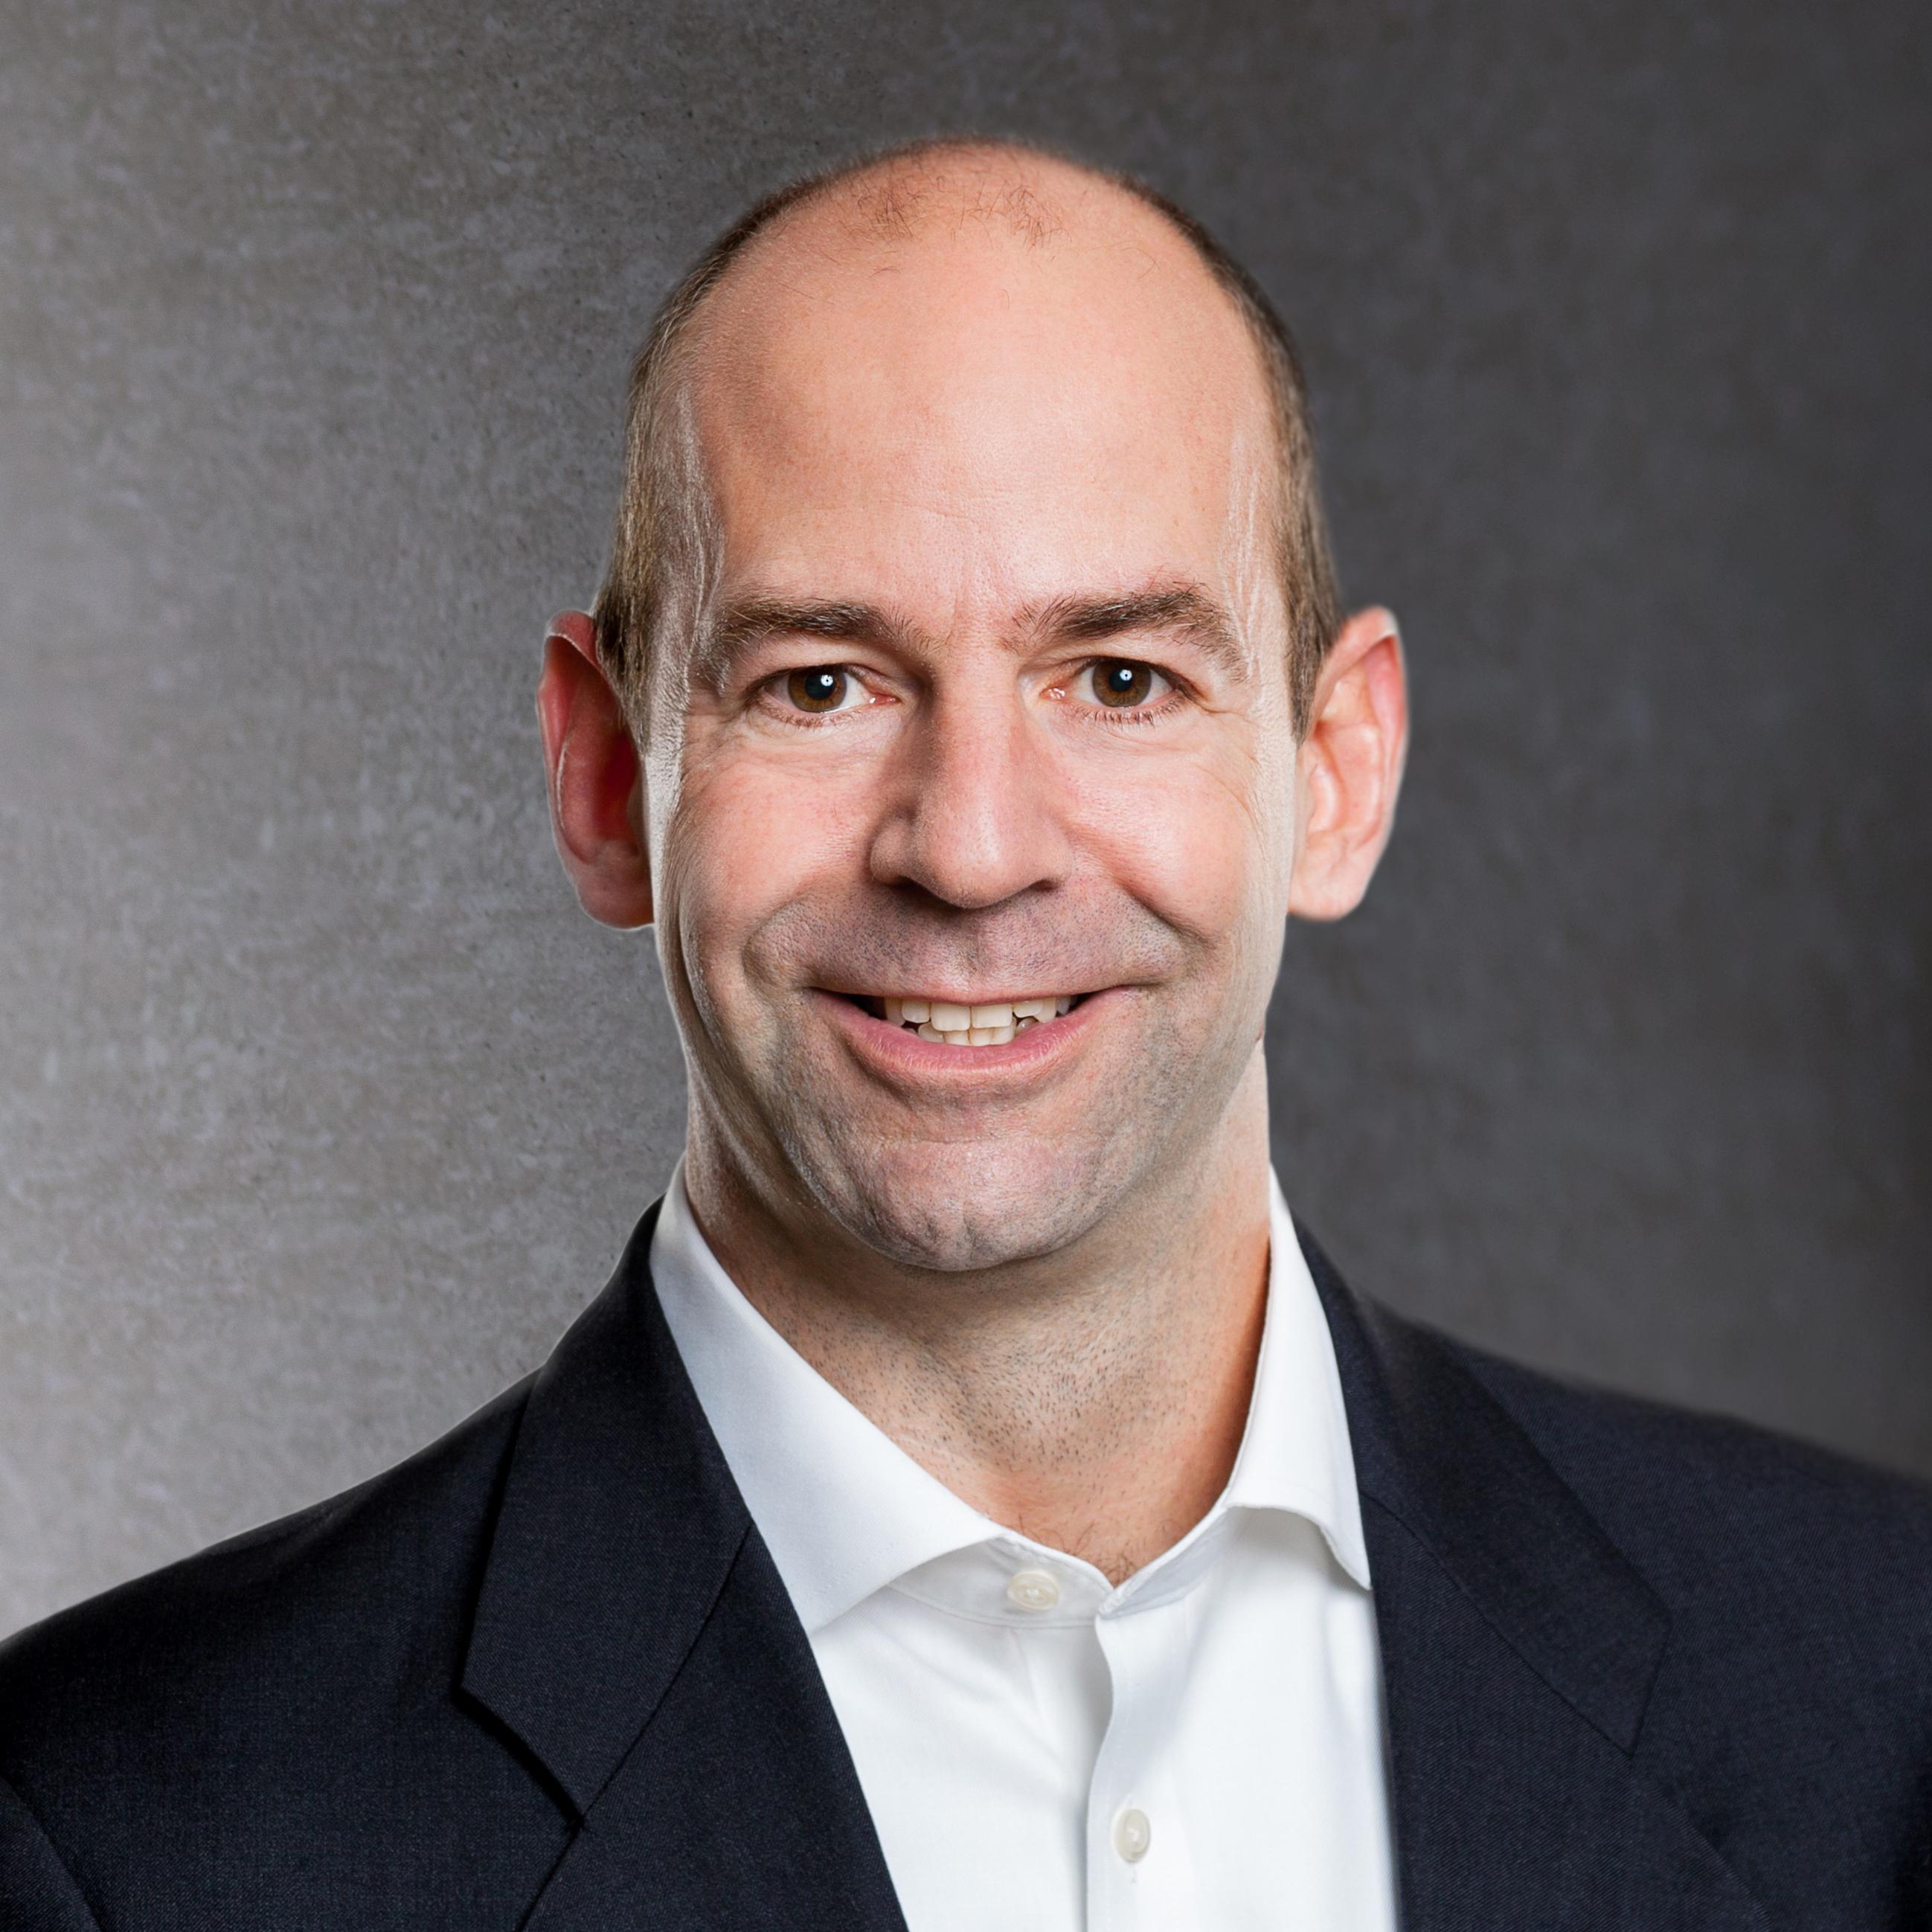 Dr. Christian Kapteyn